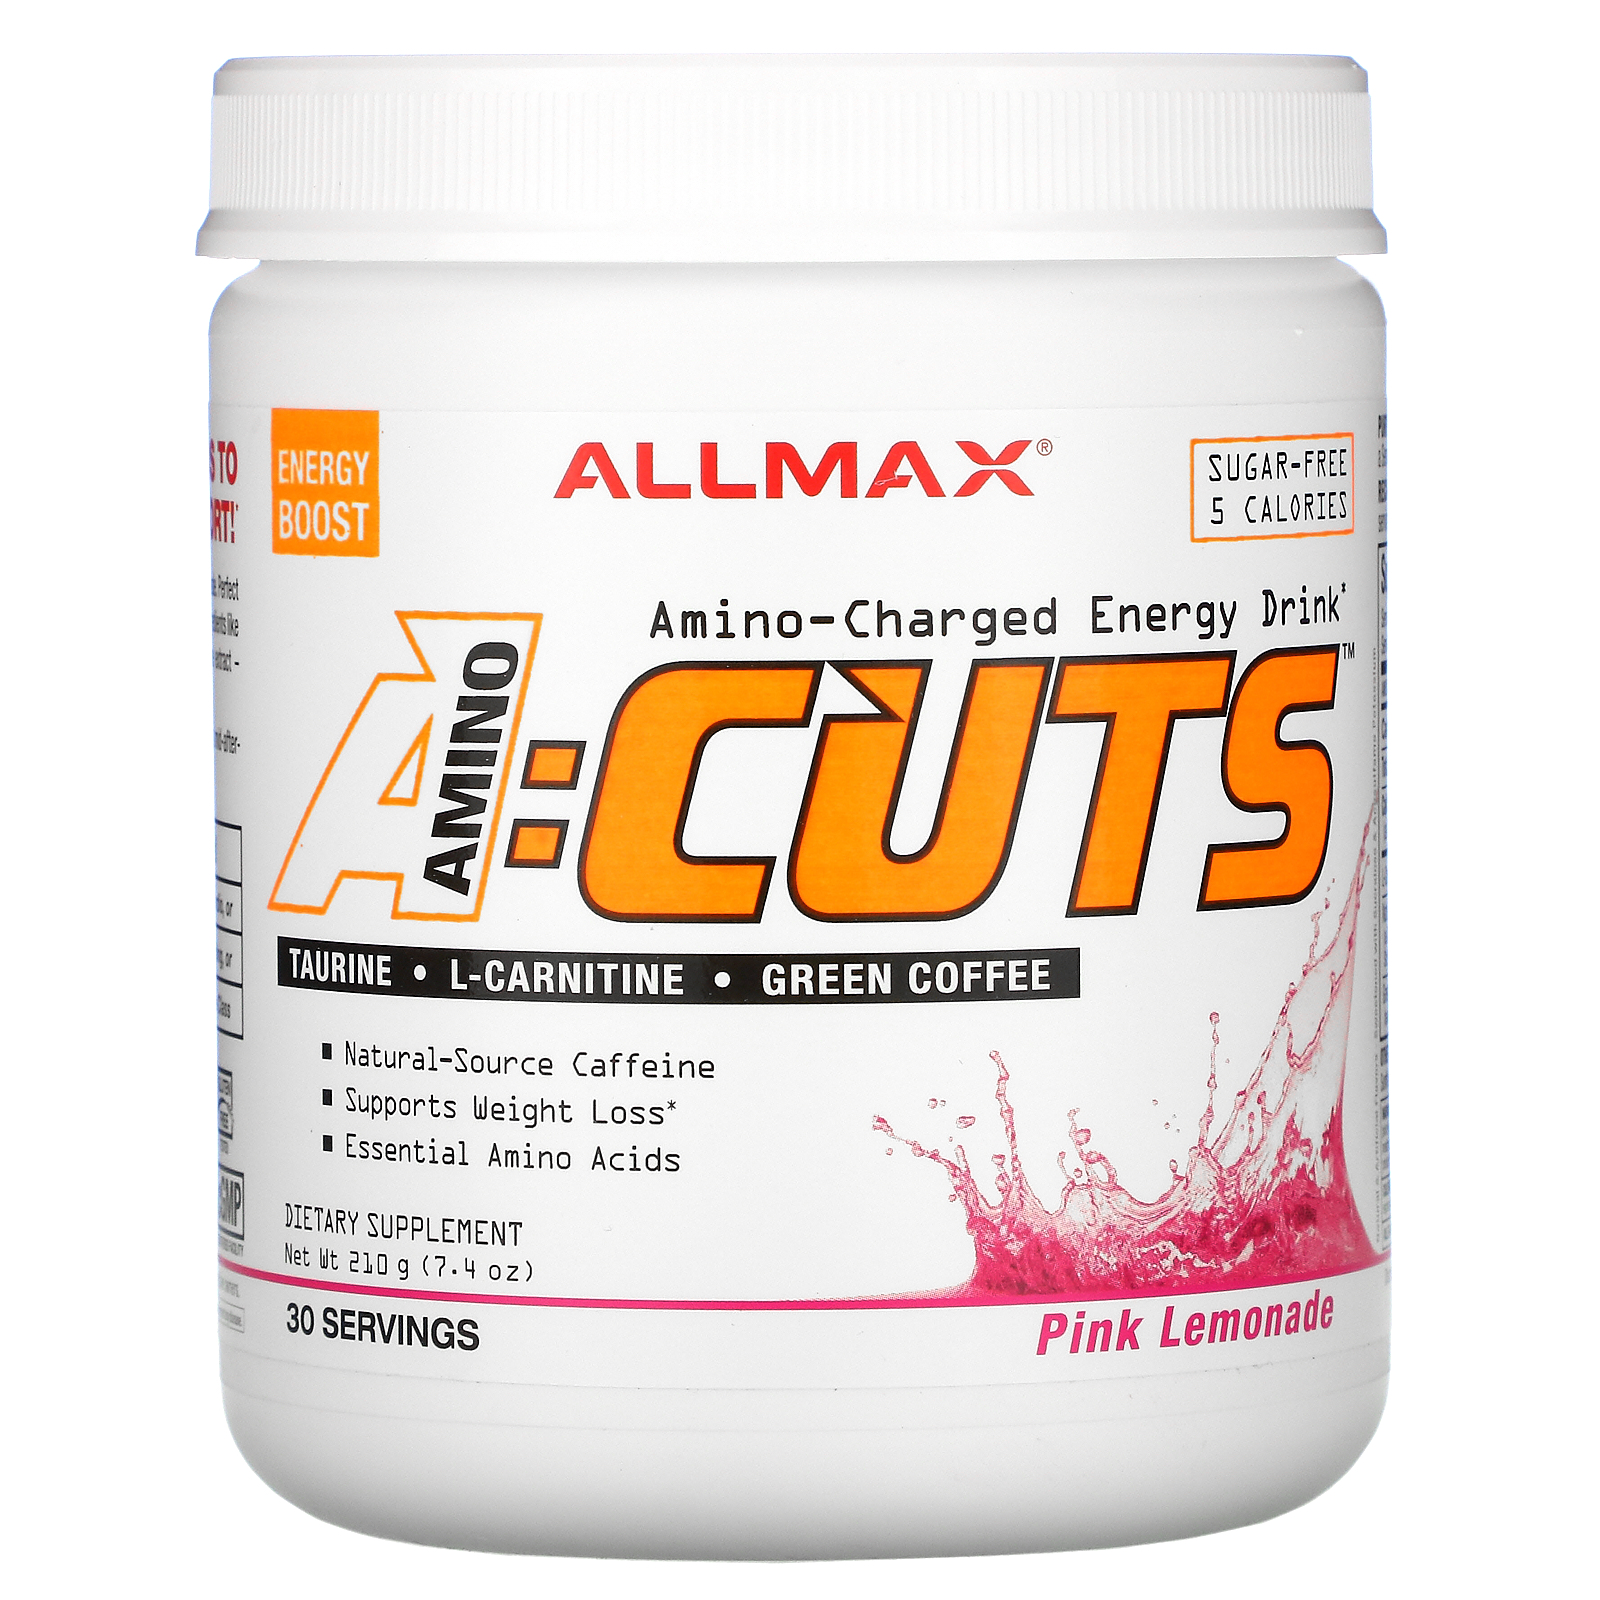 ALLMAX Nutrition, AMINOCUTS (ACUTS), Weight-Loss BCAA (CLA + Taurine + Green Coffee), Pink Lemonade, 7.4 oz (210 g)